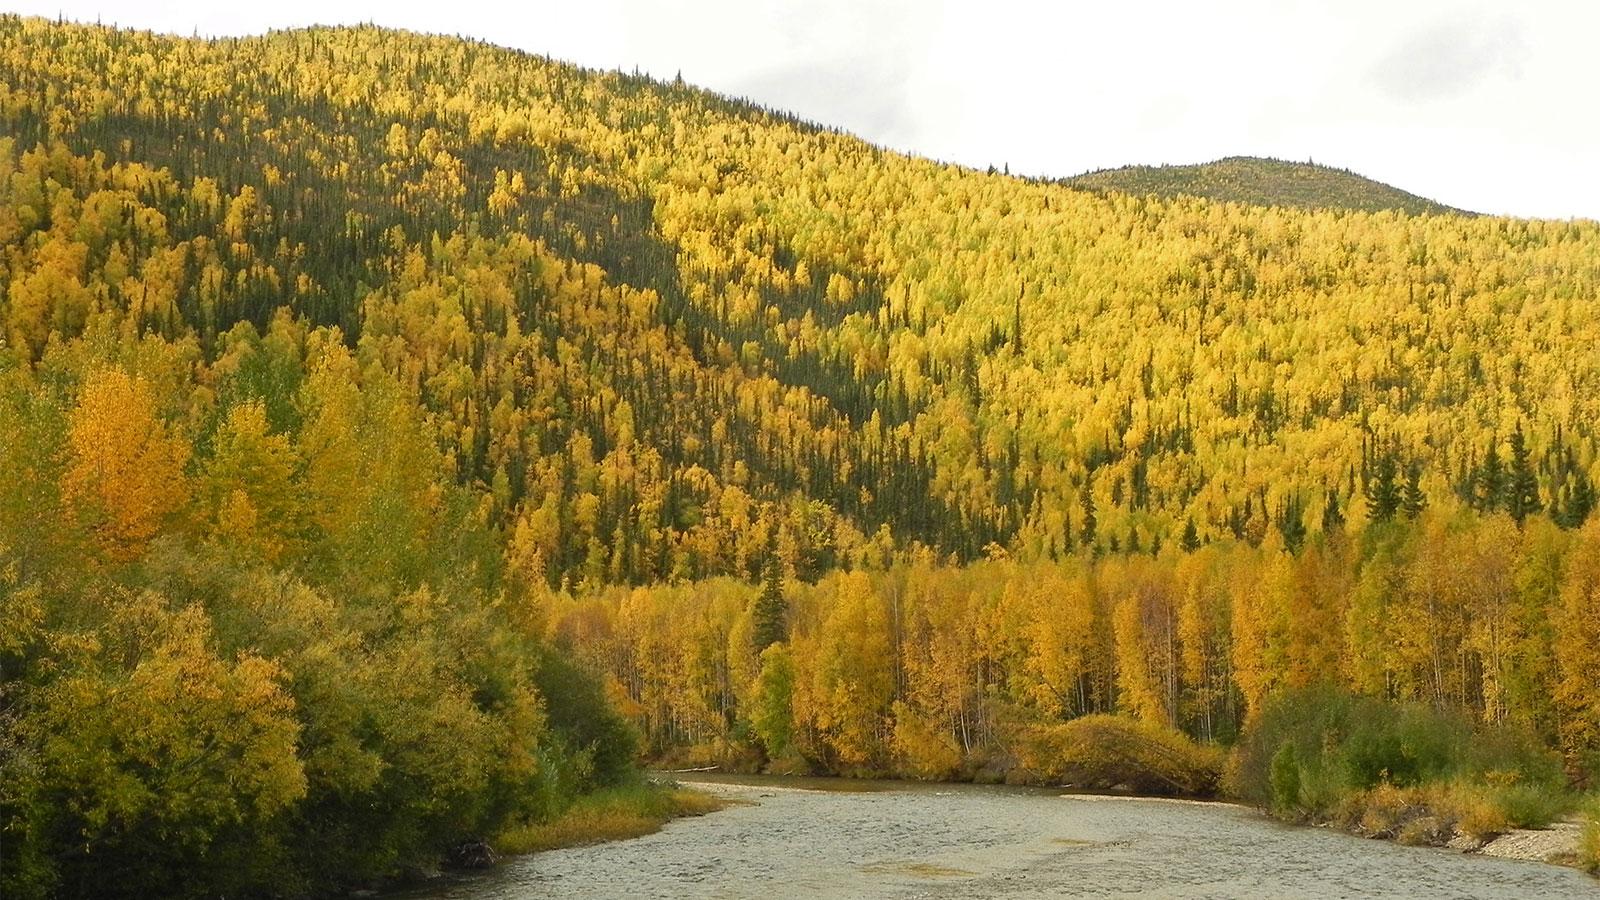 Aspens and birch trees growing near Fairbanks, Alaska